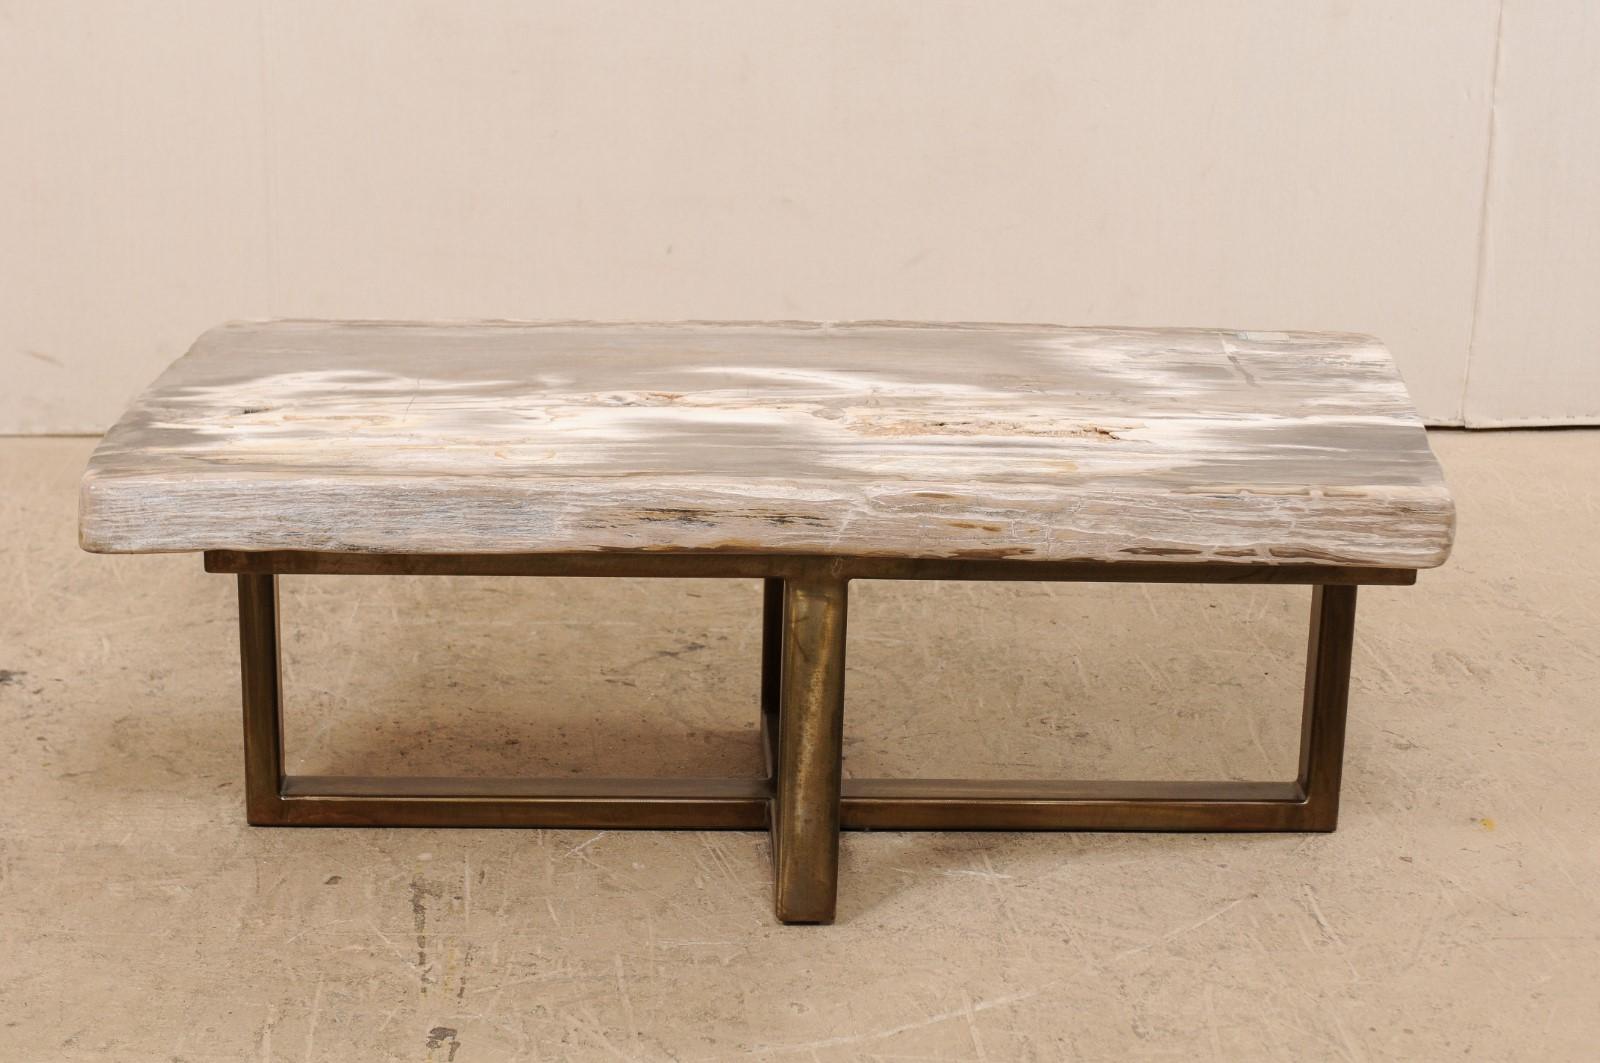 Custom petrified wood coffee table with modern metal base for sale at 1stdibs